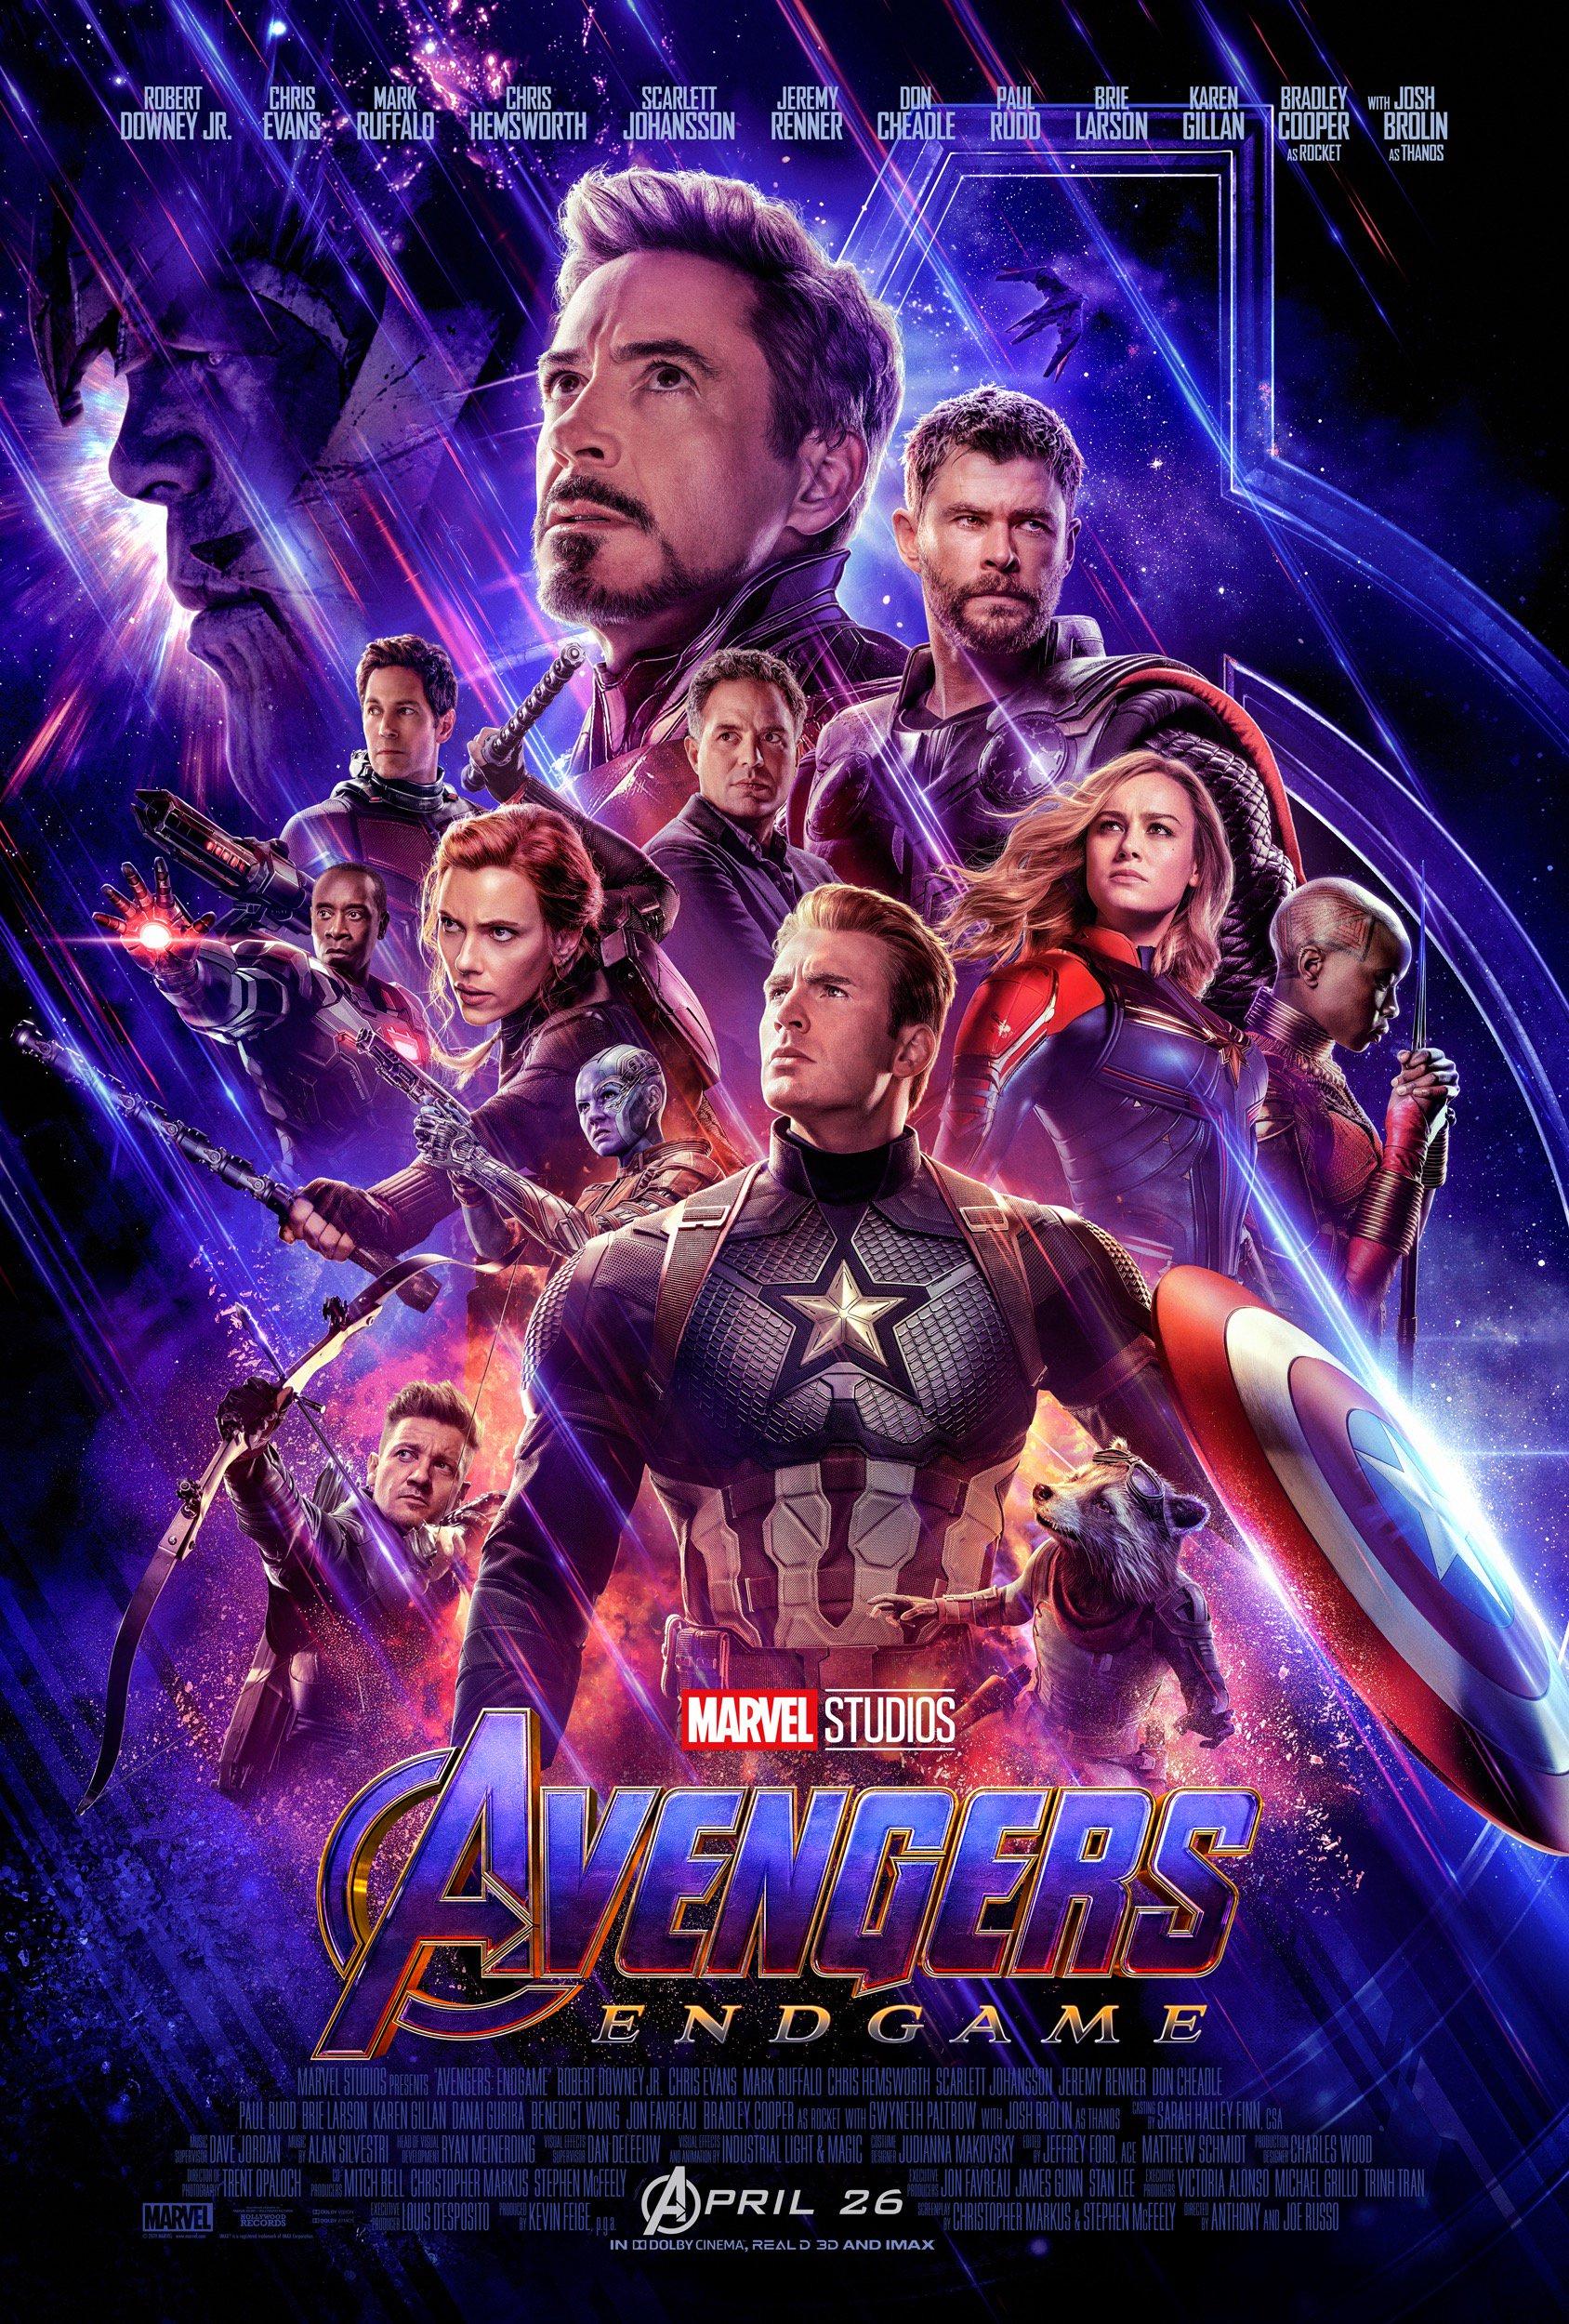 surprise-marvel-releases-a-new-full-trailer-and-poster-for-avengers-endgame1